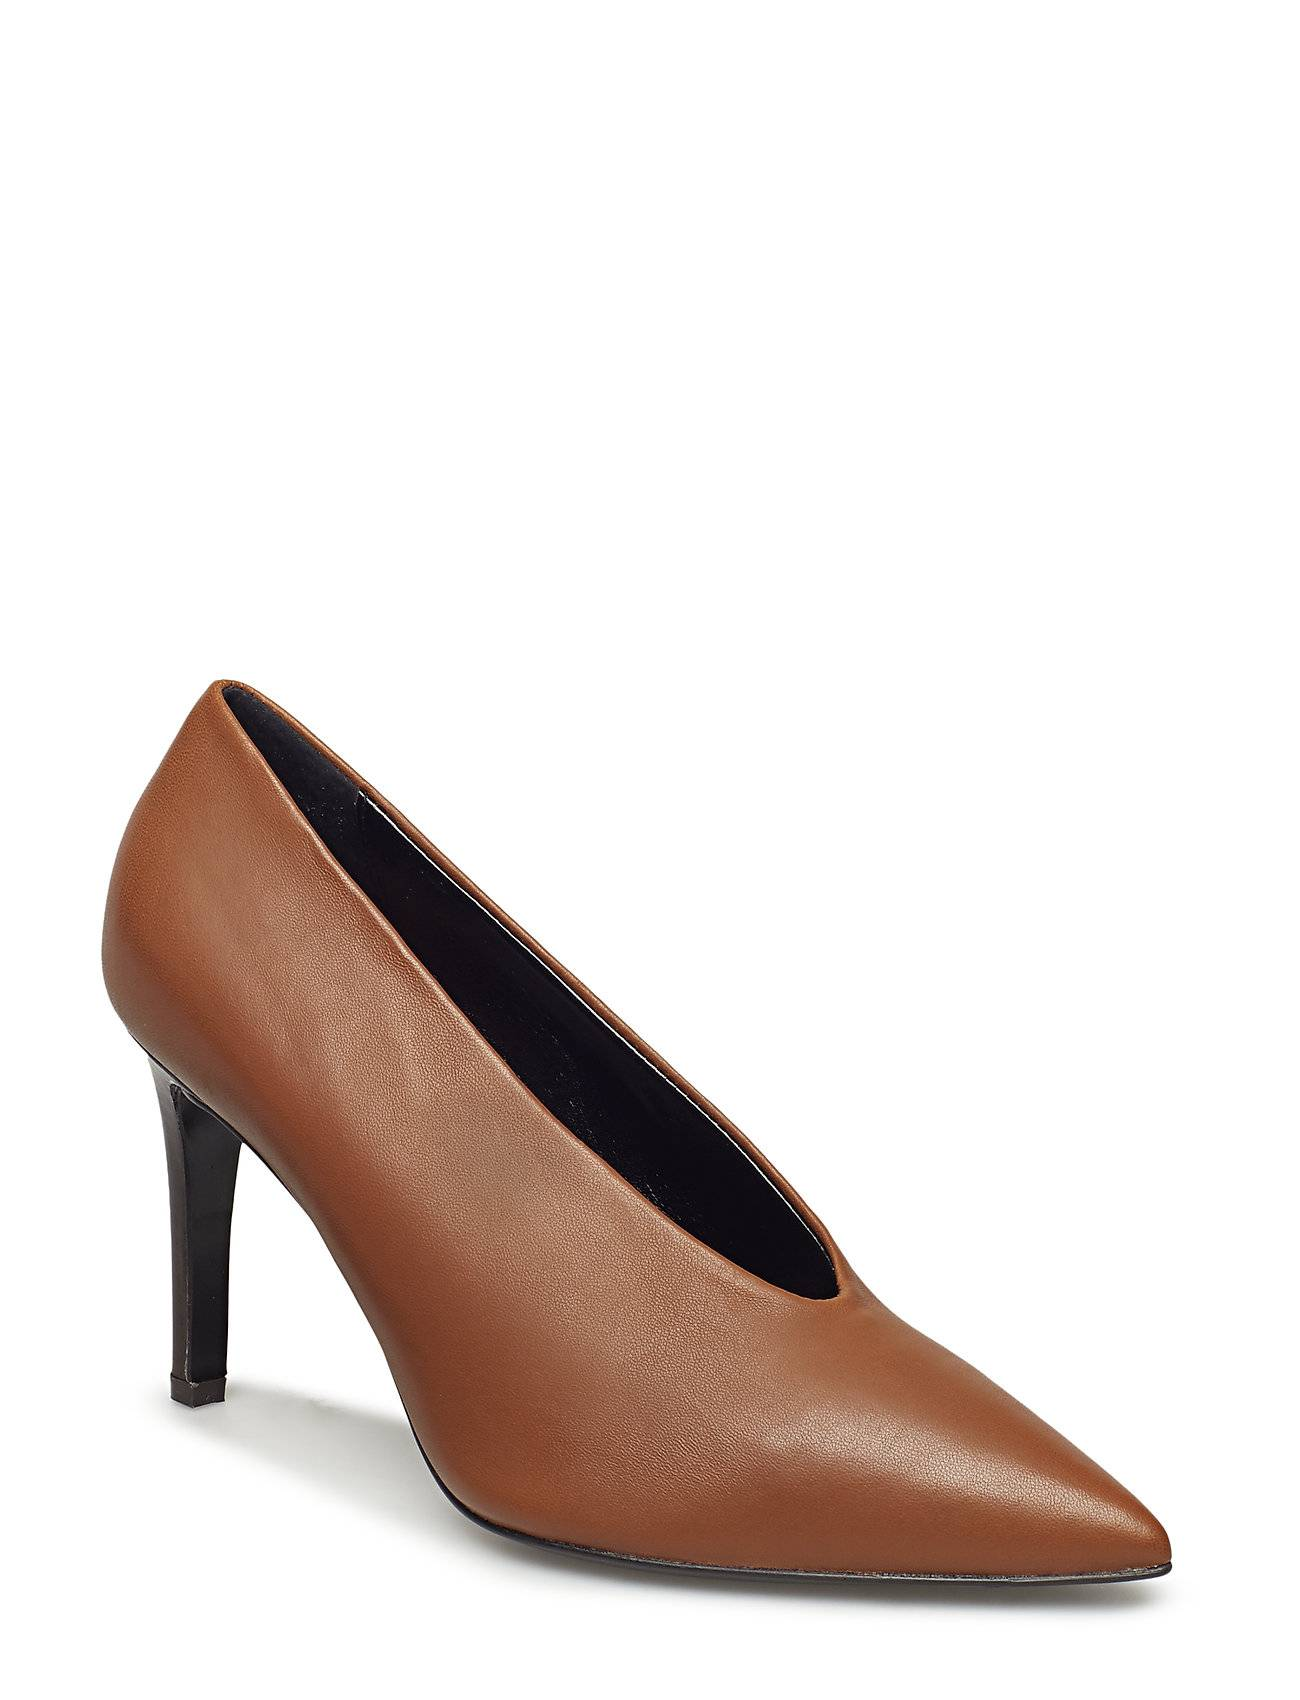 Apair Narrow Cut Shoes Heels Pumps Classic Ruskea Apair